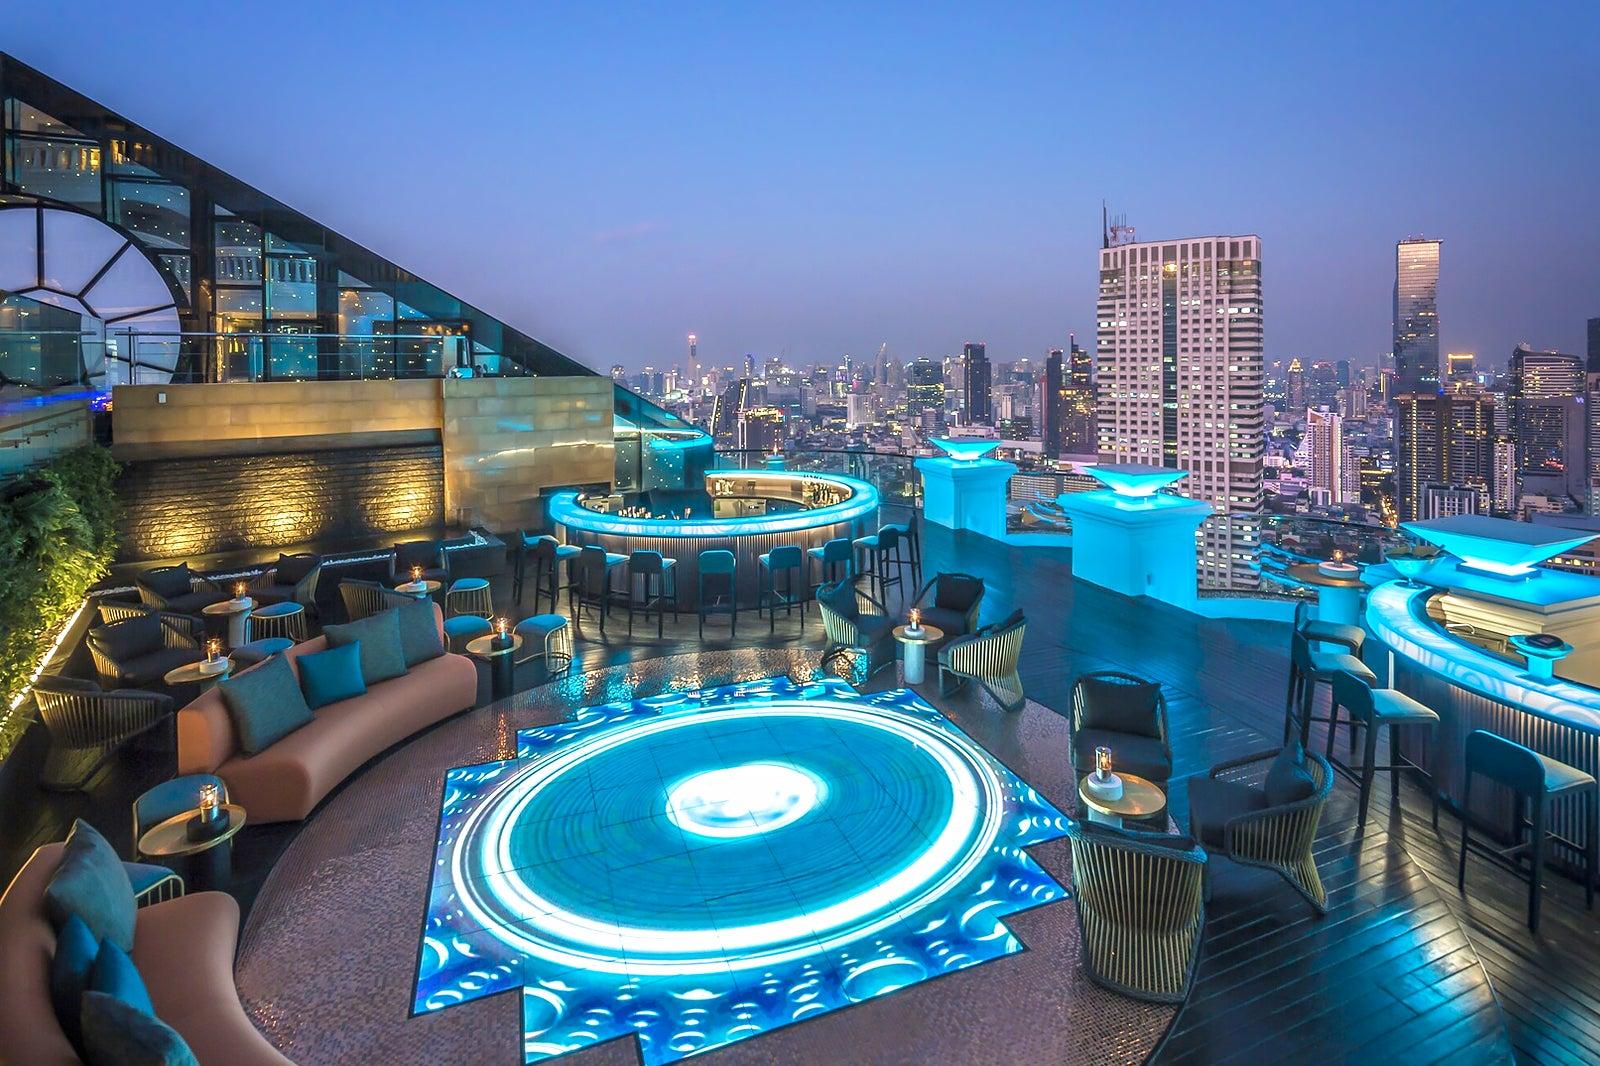 Sky Bar at Lebua Bangkok - Rooftop Bar in Silom